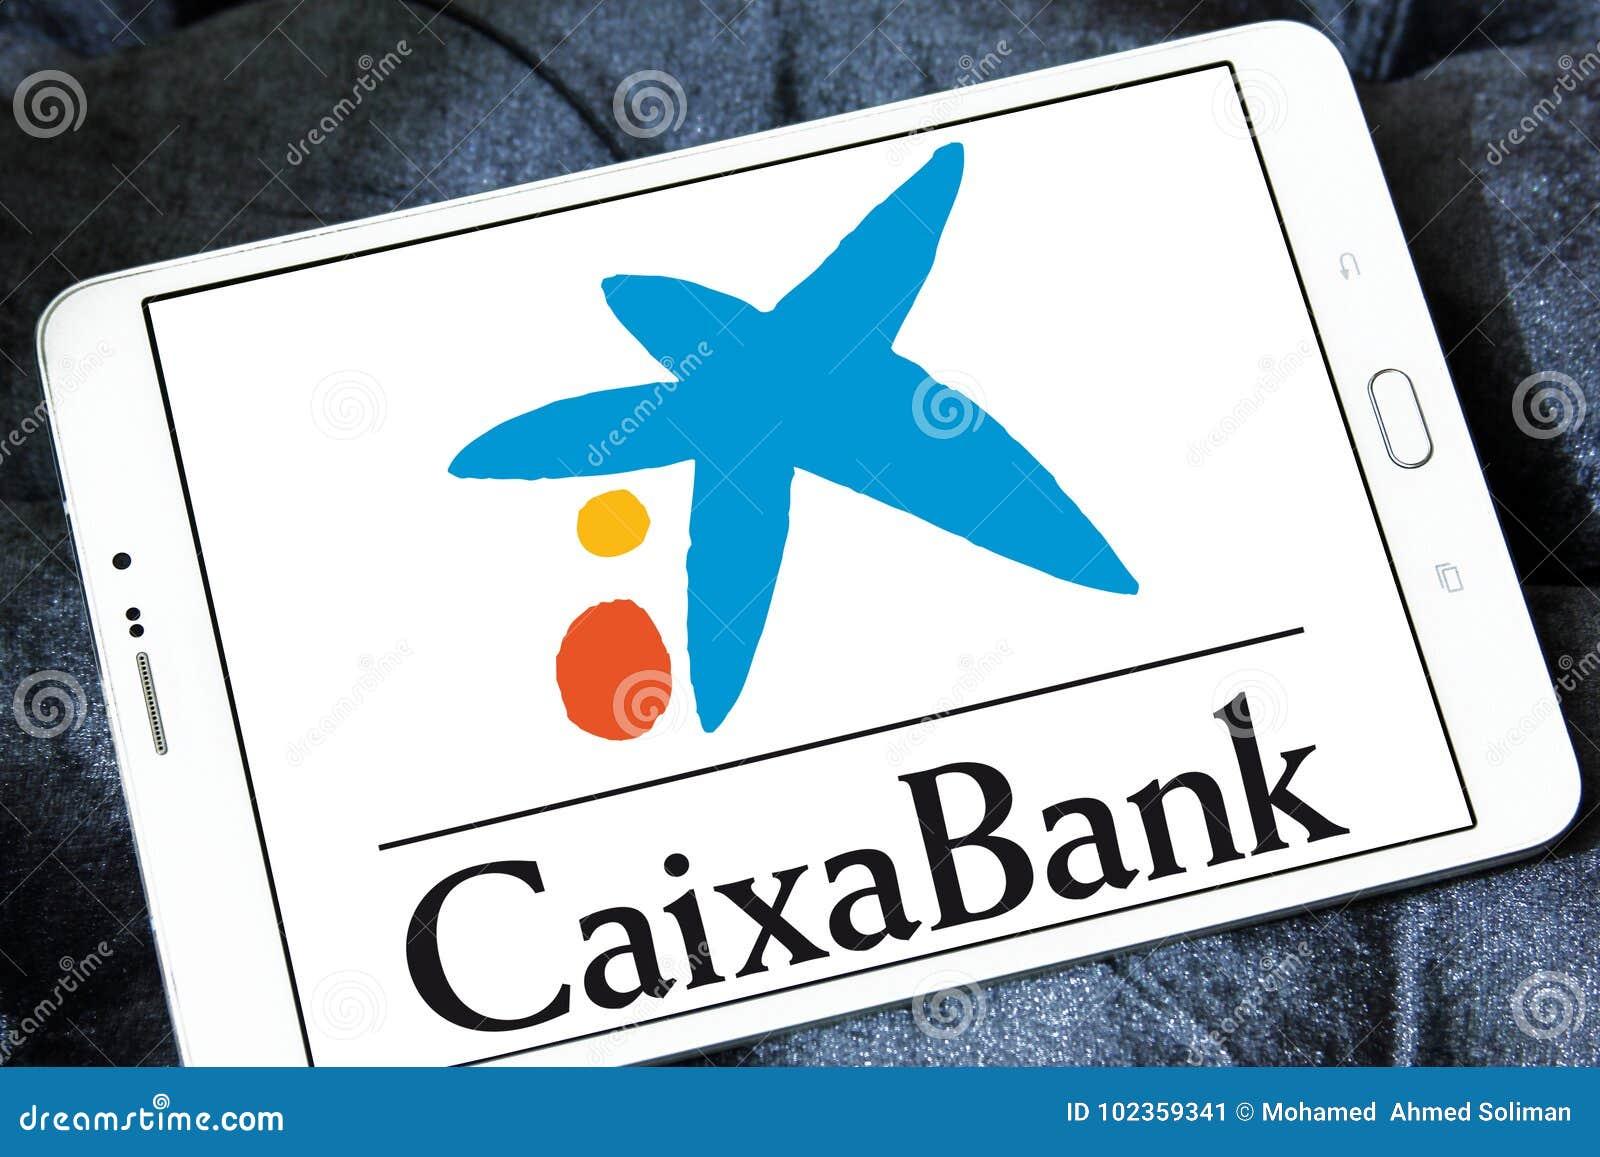 CaixaBank logo editorial photo  Image of group, capital